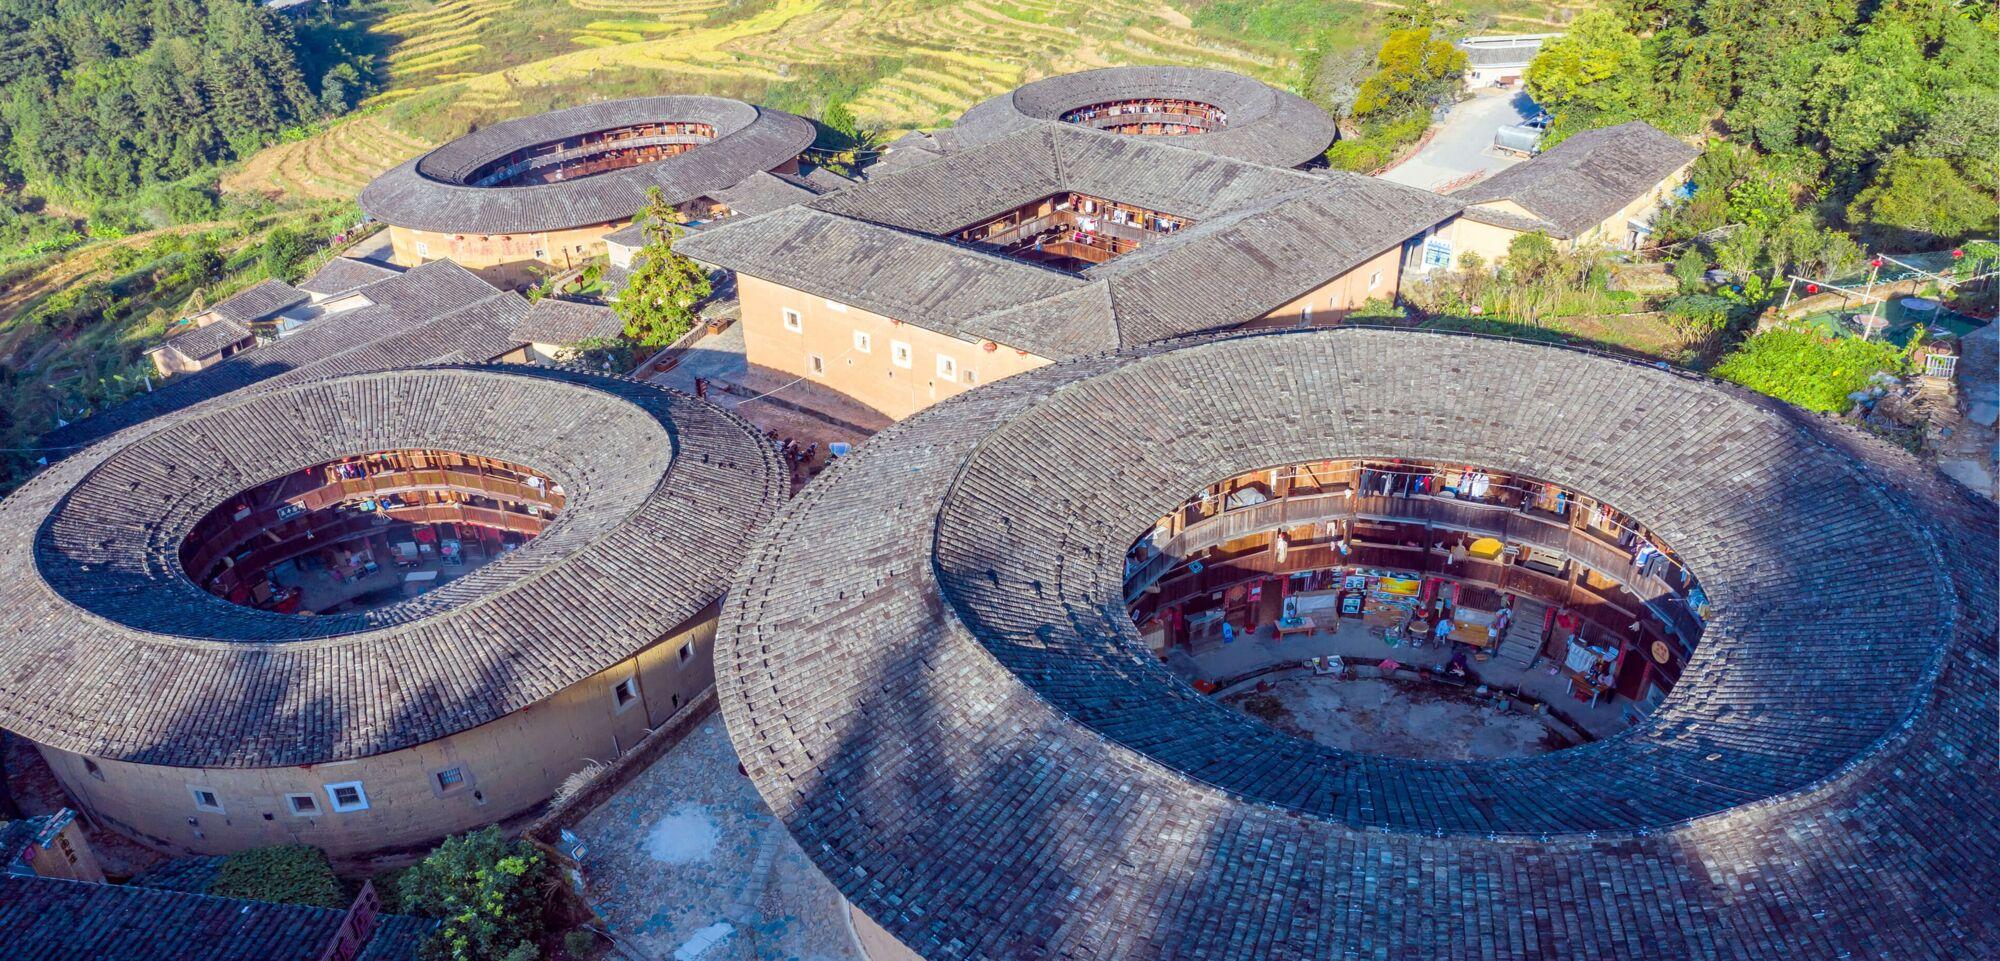 Fujian tulou, China